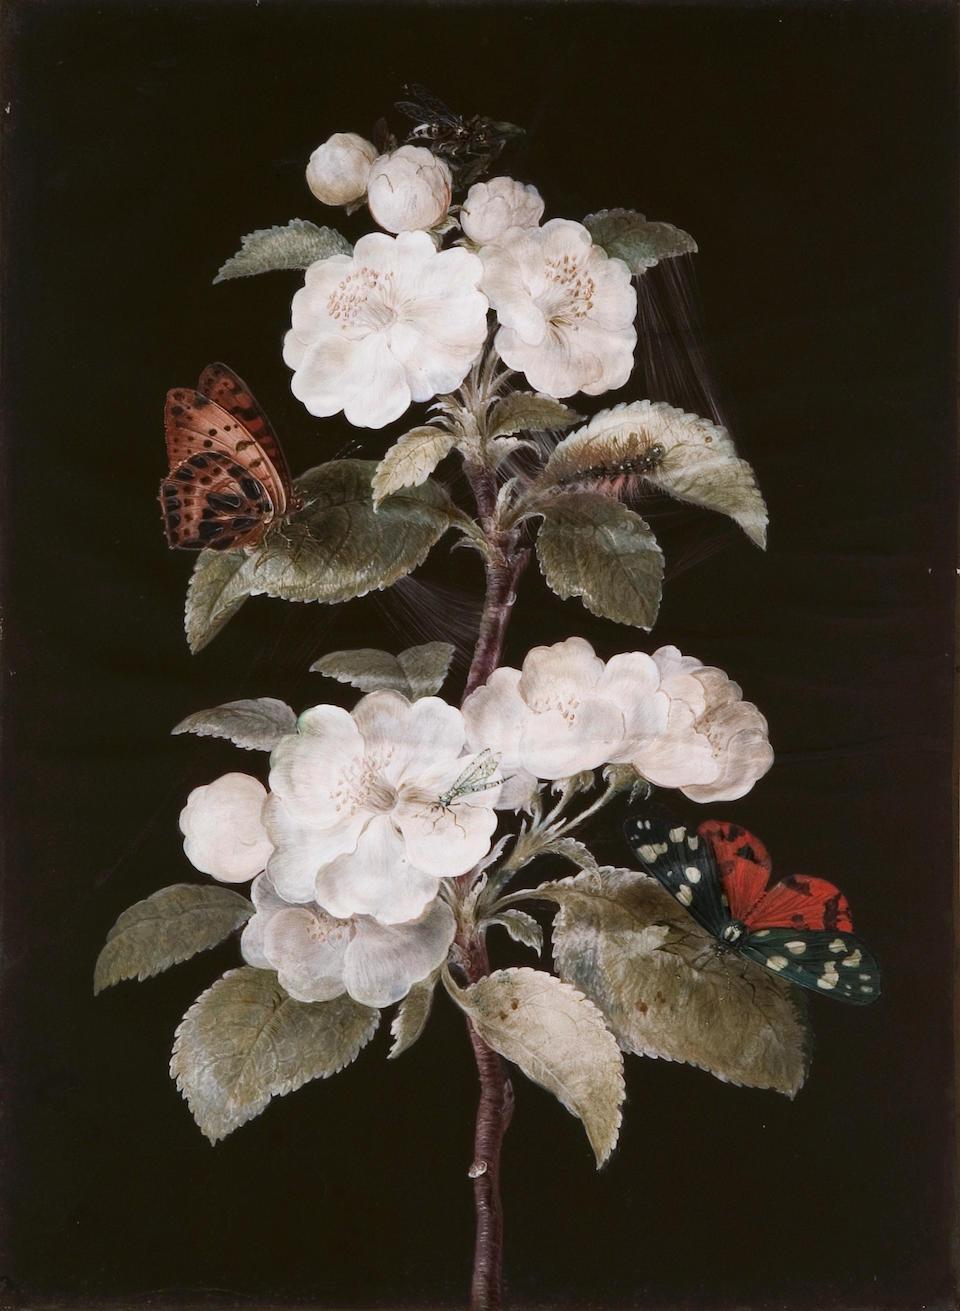 Dietzsch (Johann Cristoph, 1710-1769), Barbara Regina Dietzsch (1706-1783)or Margareta Barbara Dietzsch (1726-1795)